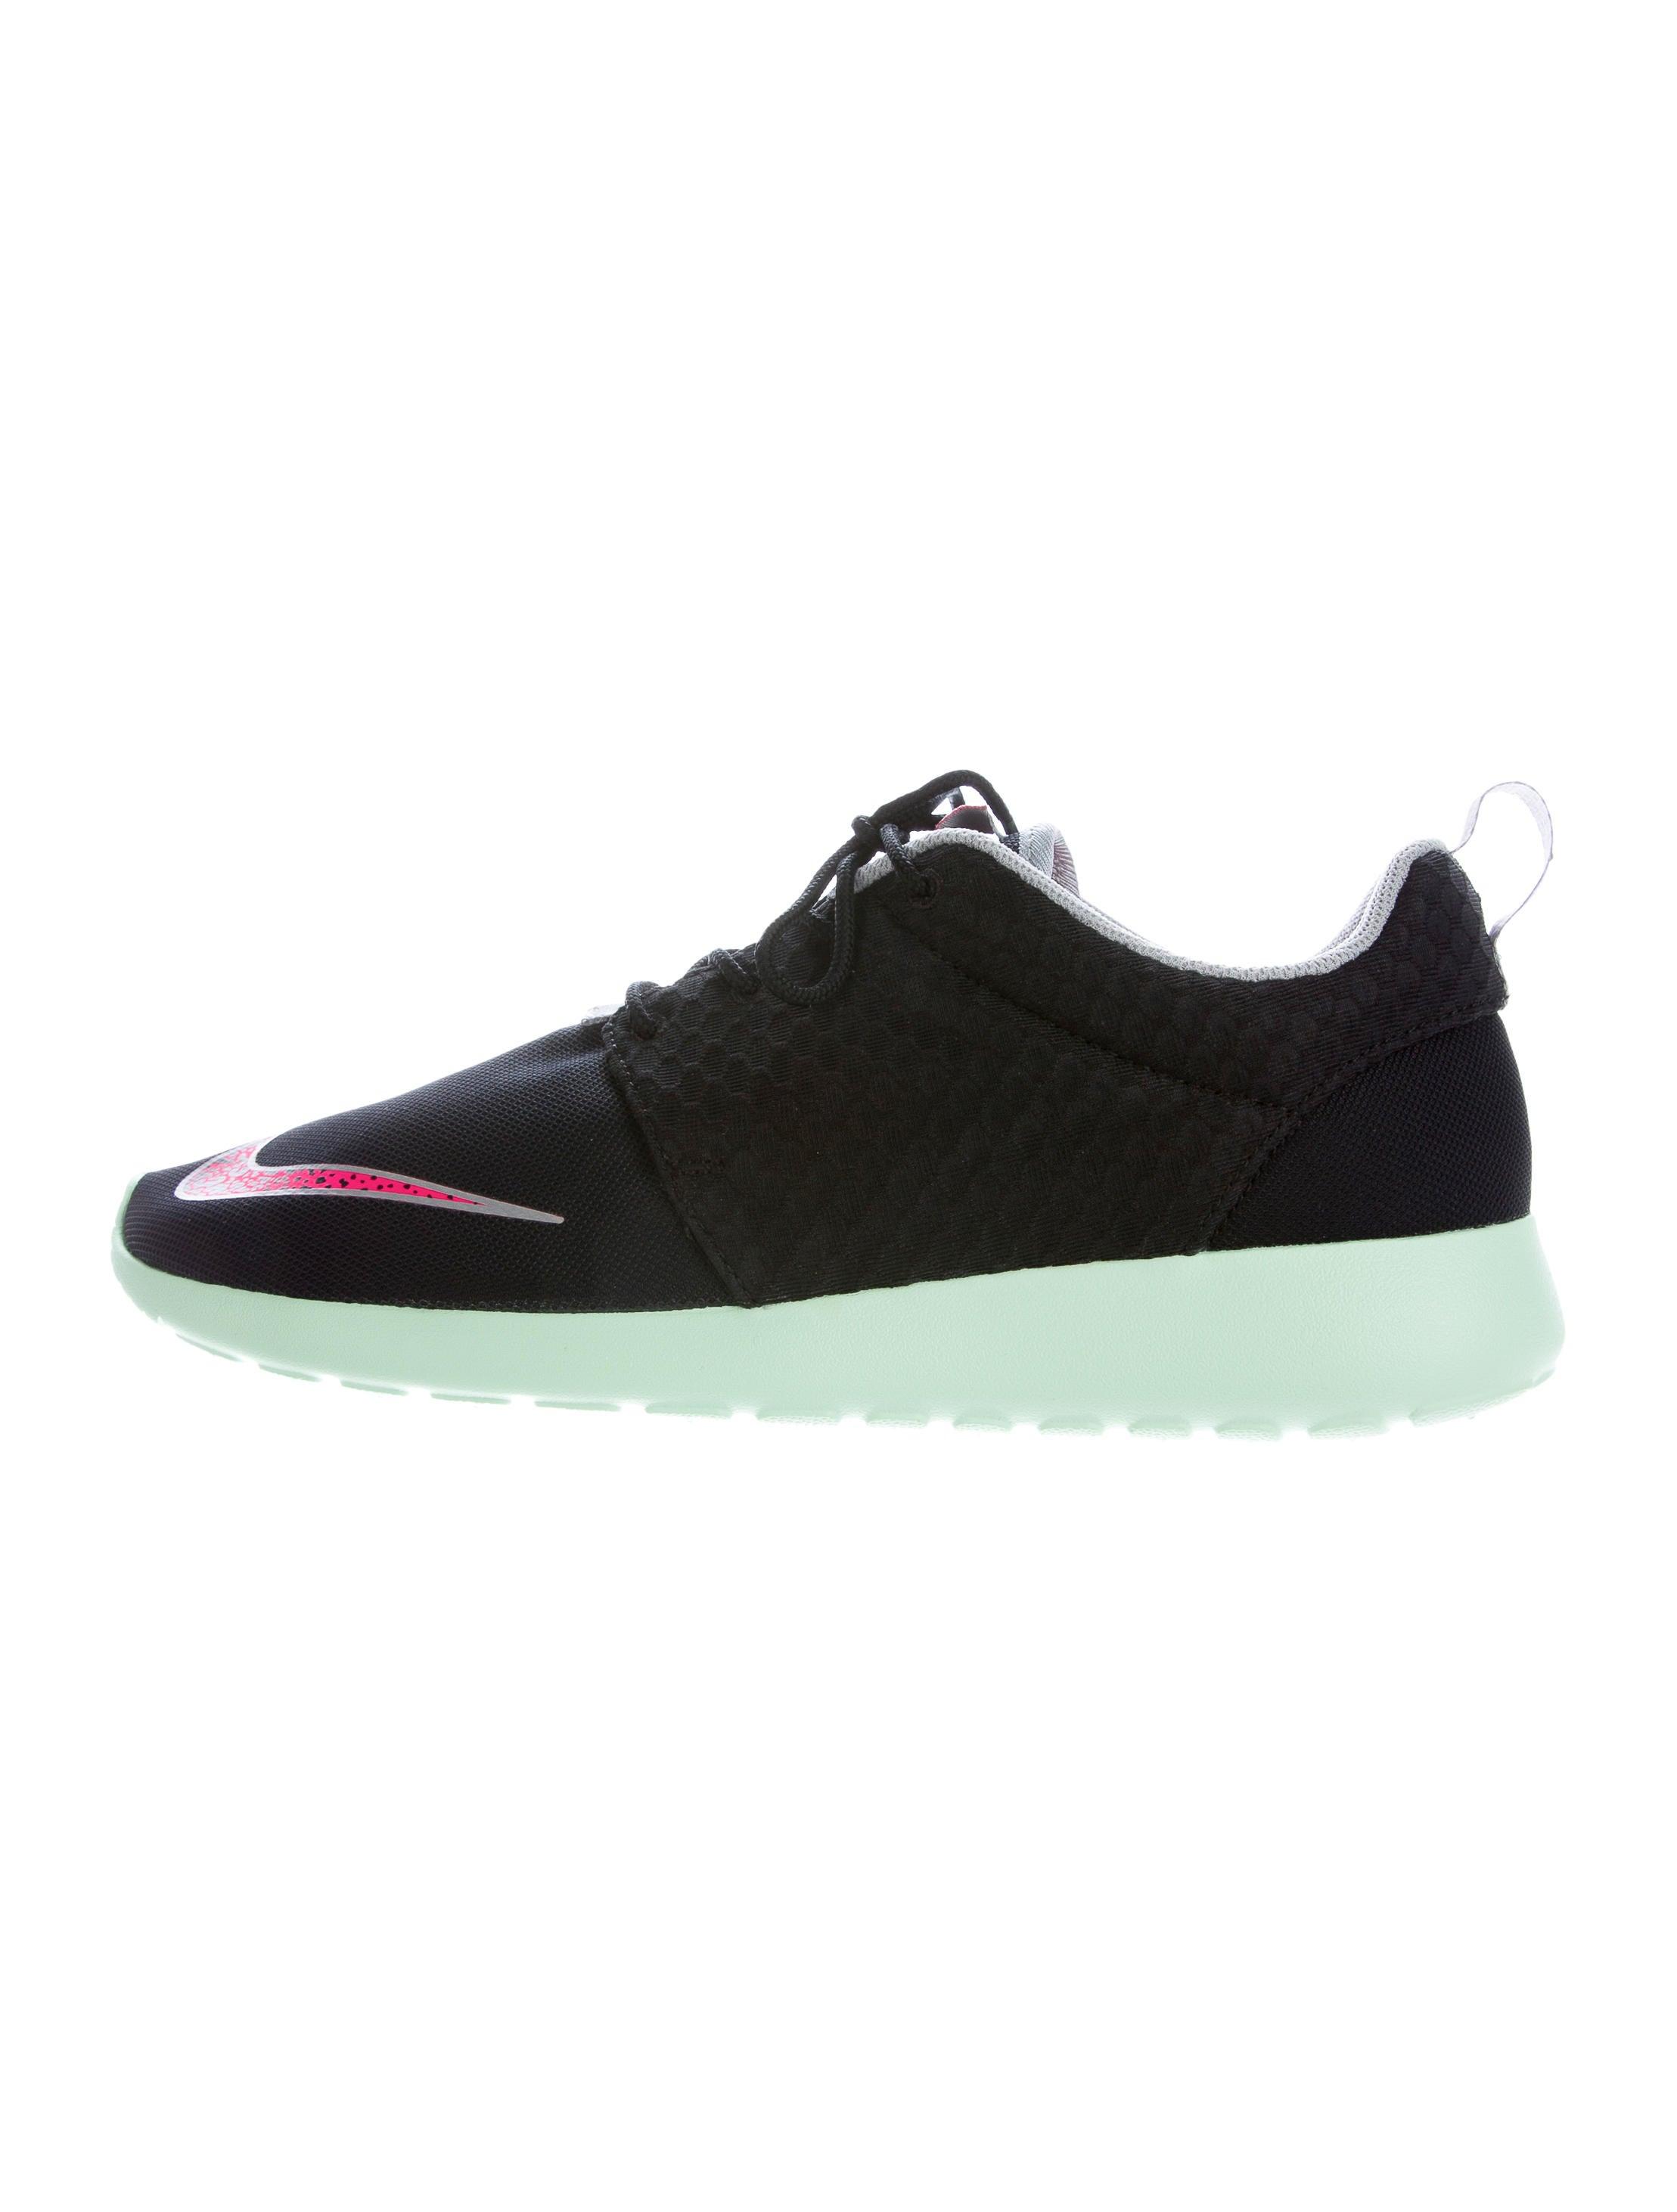 Nike Yeezy Rosherun Fb Sneakers W Tags Shoes Wu221254